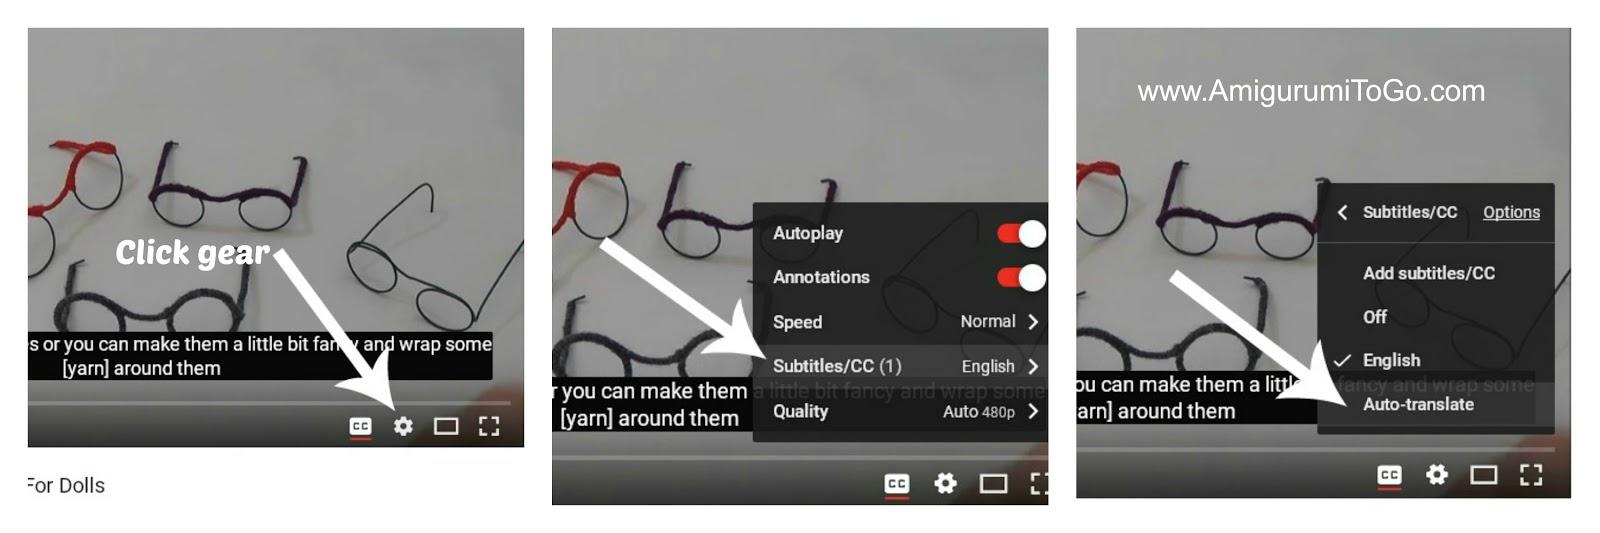 Glasses For Amigurumi : How To Make Glasses For Amigurumi ~ Amigurumi To Go